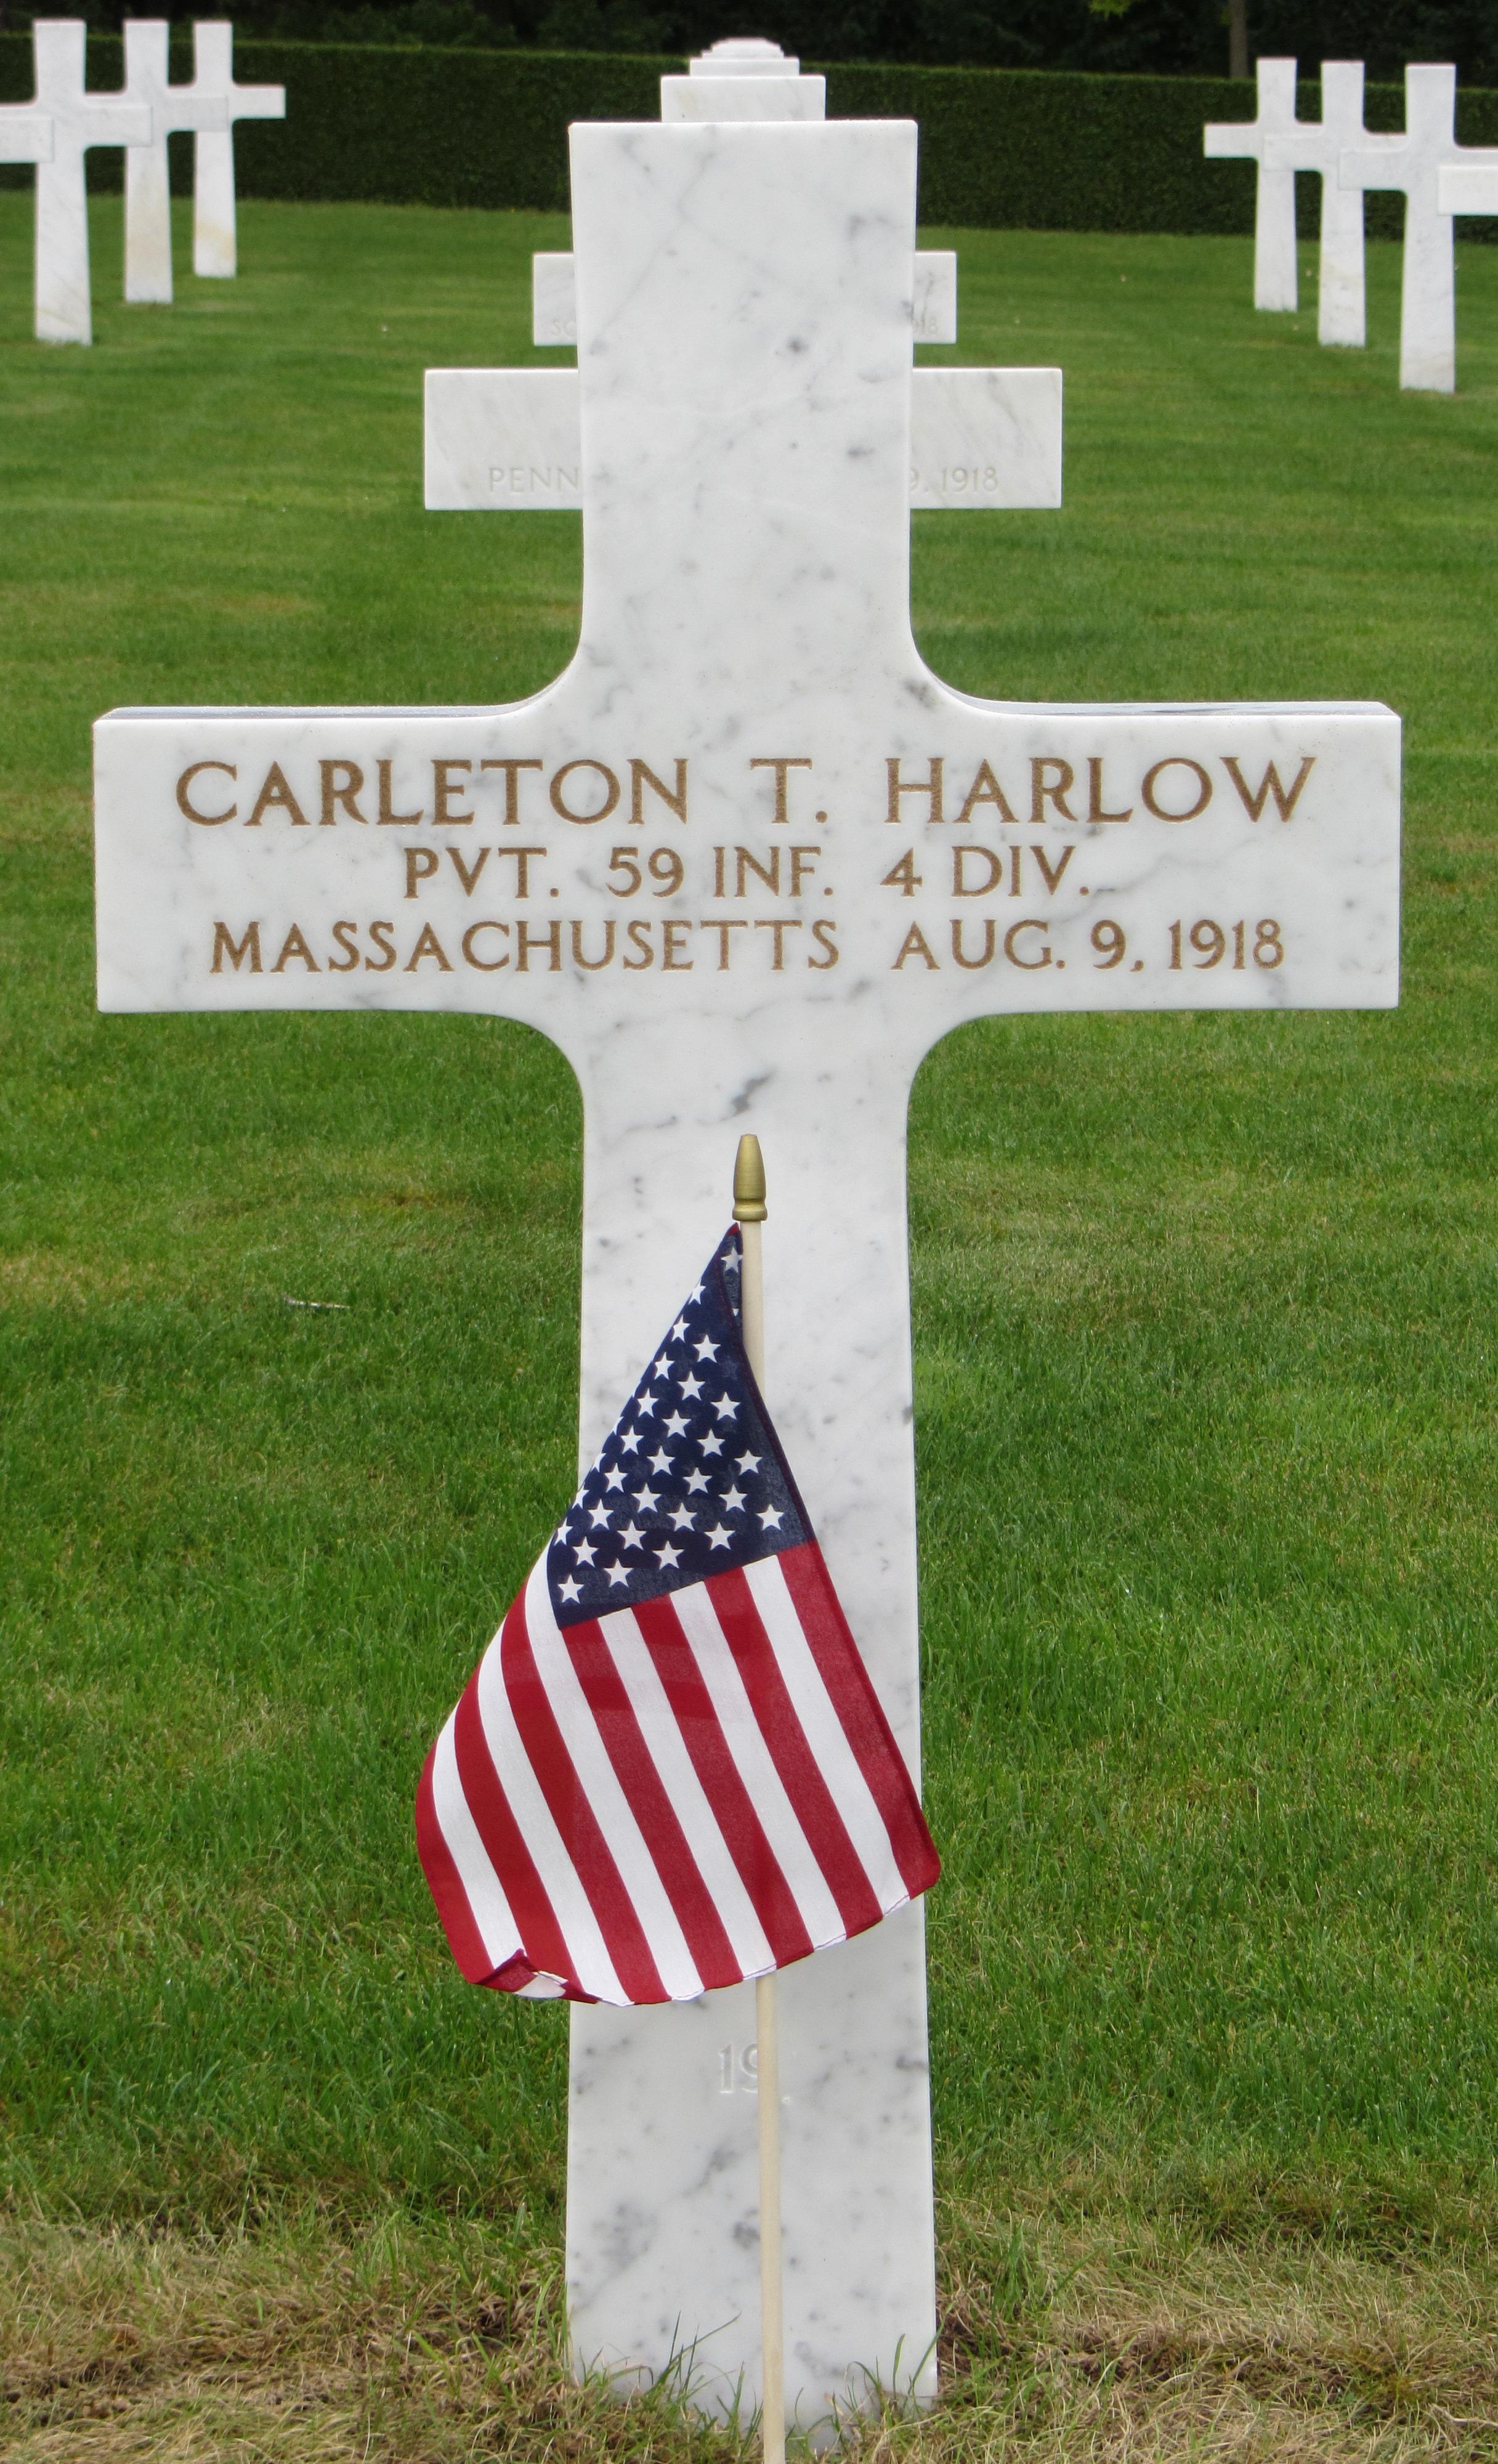 Carleton T. Harlow Grave